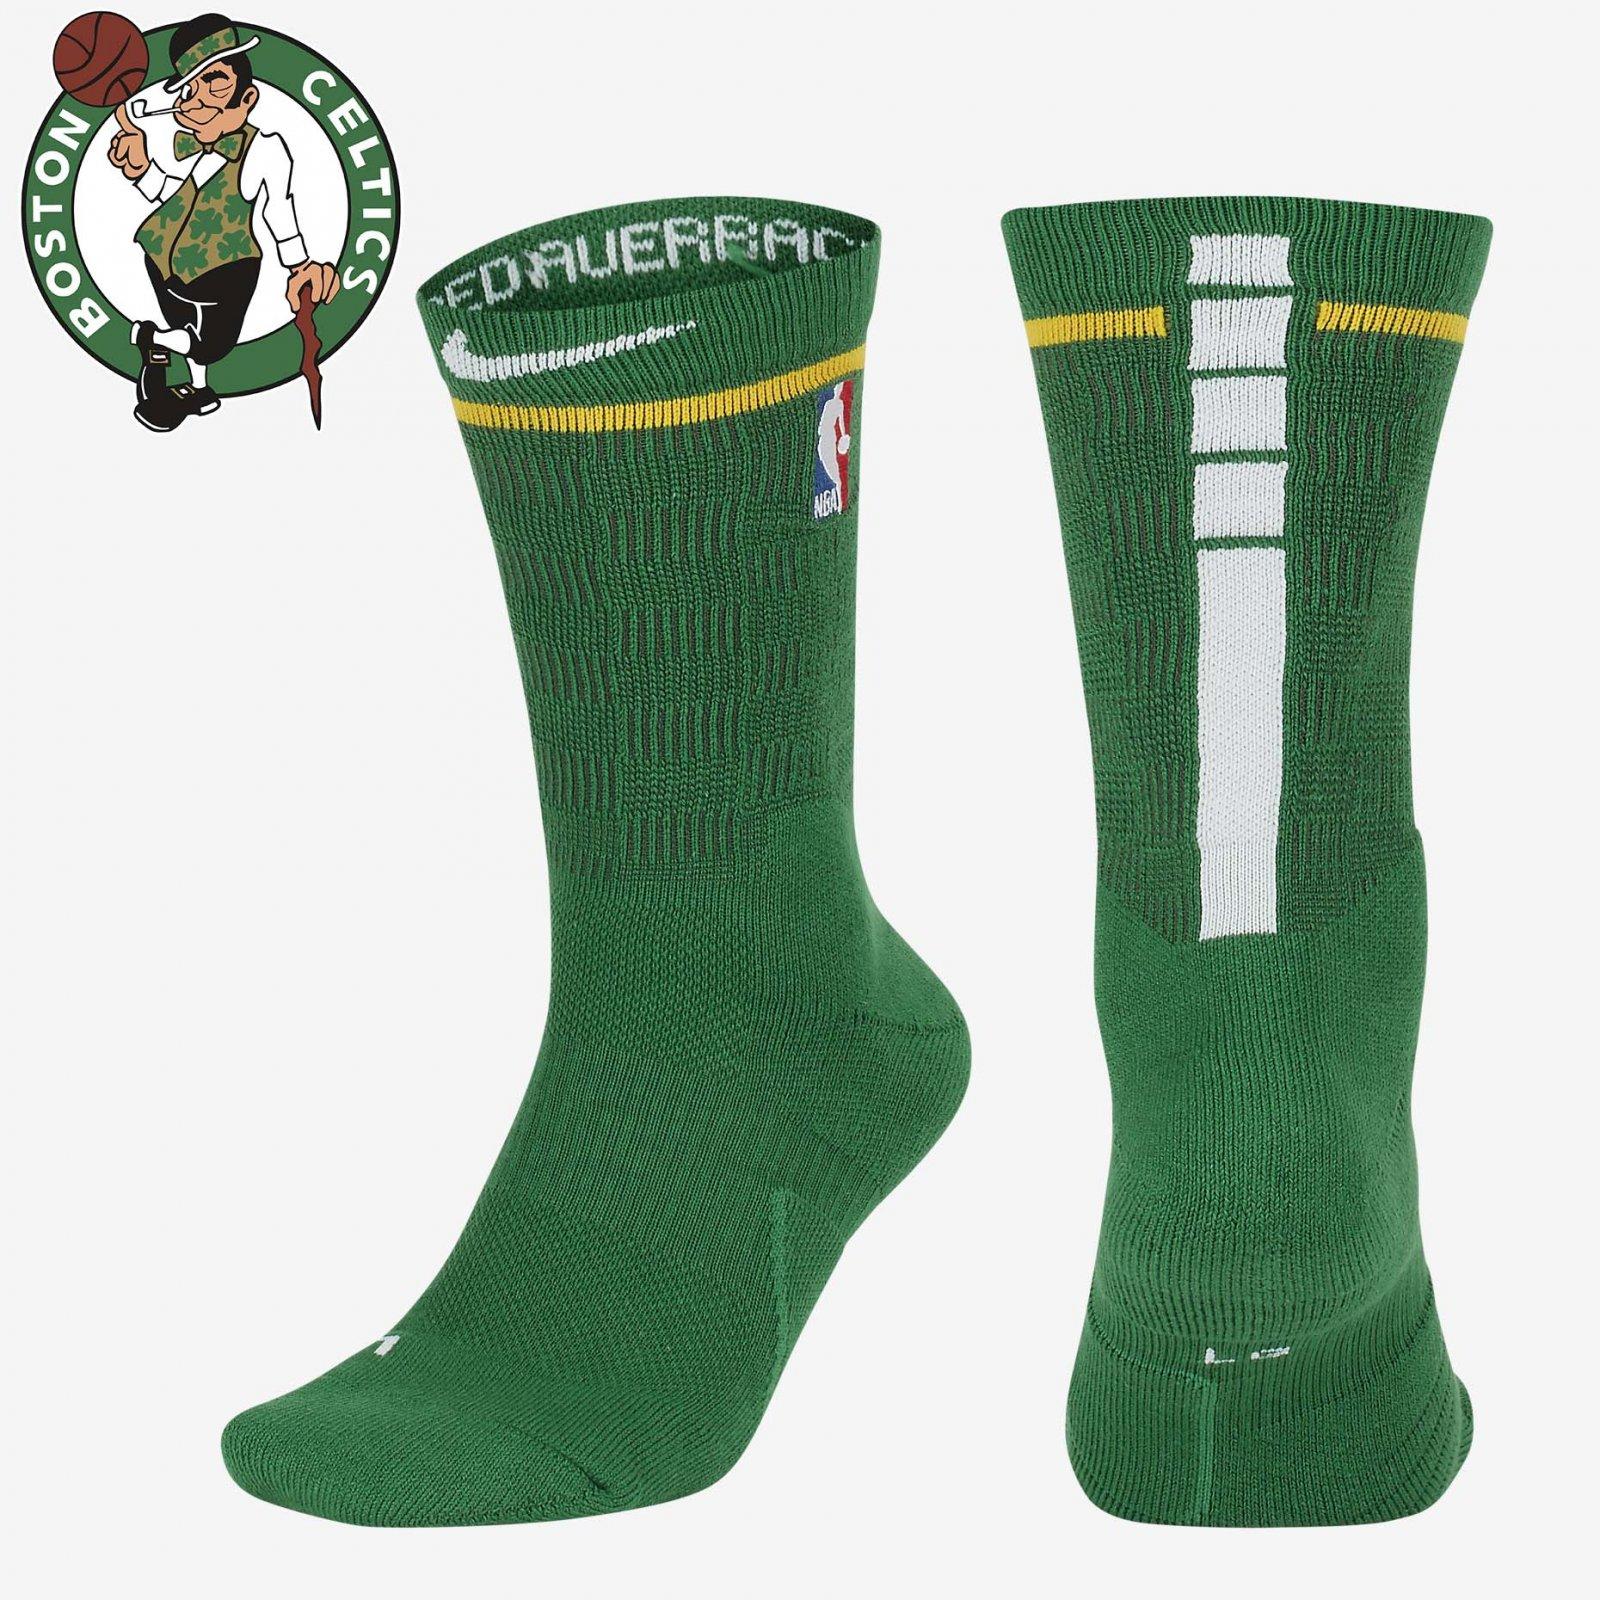 da1a31de3 Details about NBA Nike Elite City Edition Crew Bosten Celtics Green White  BOS Socks SX5988-312